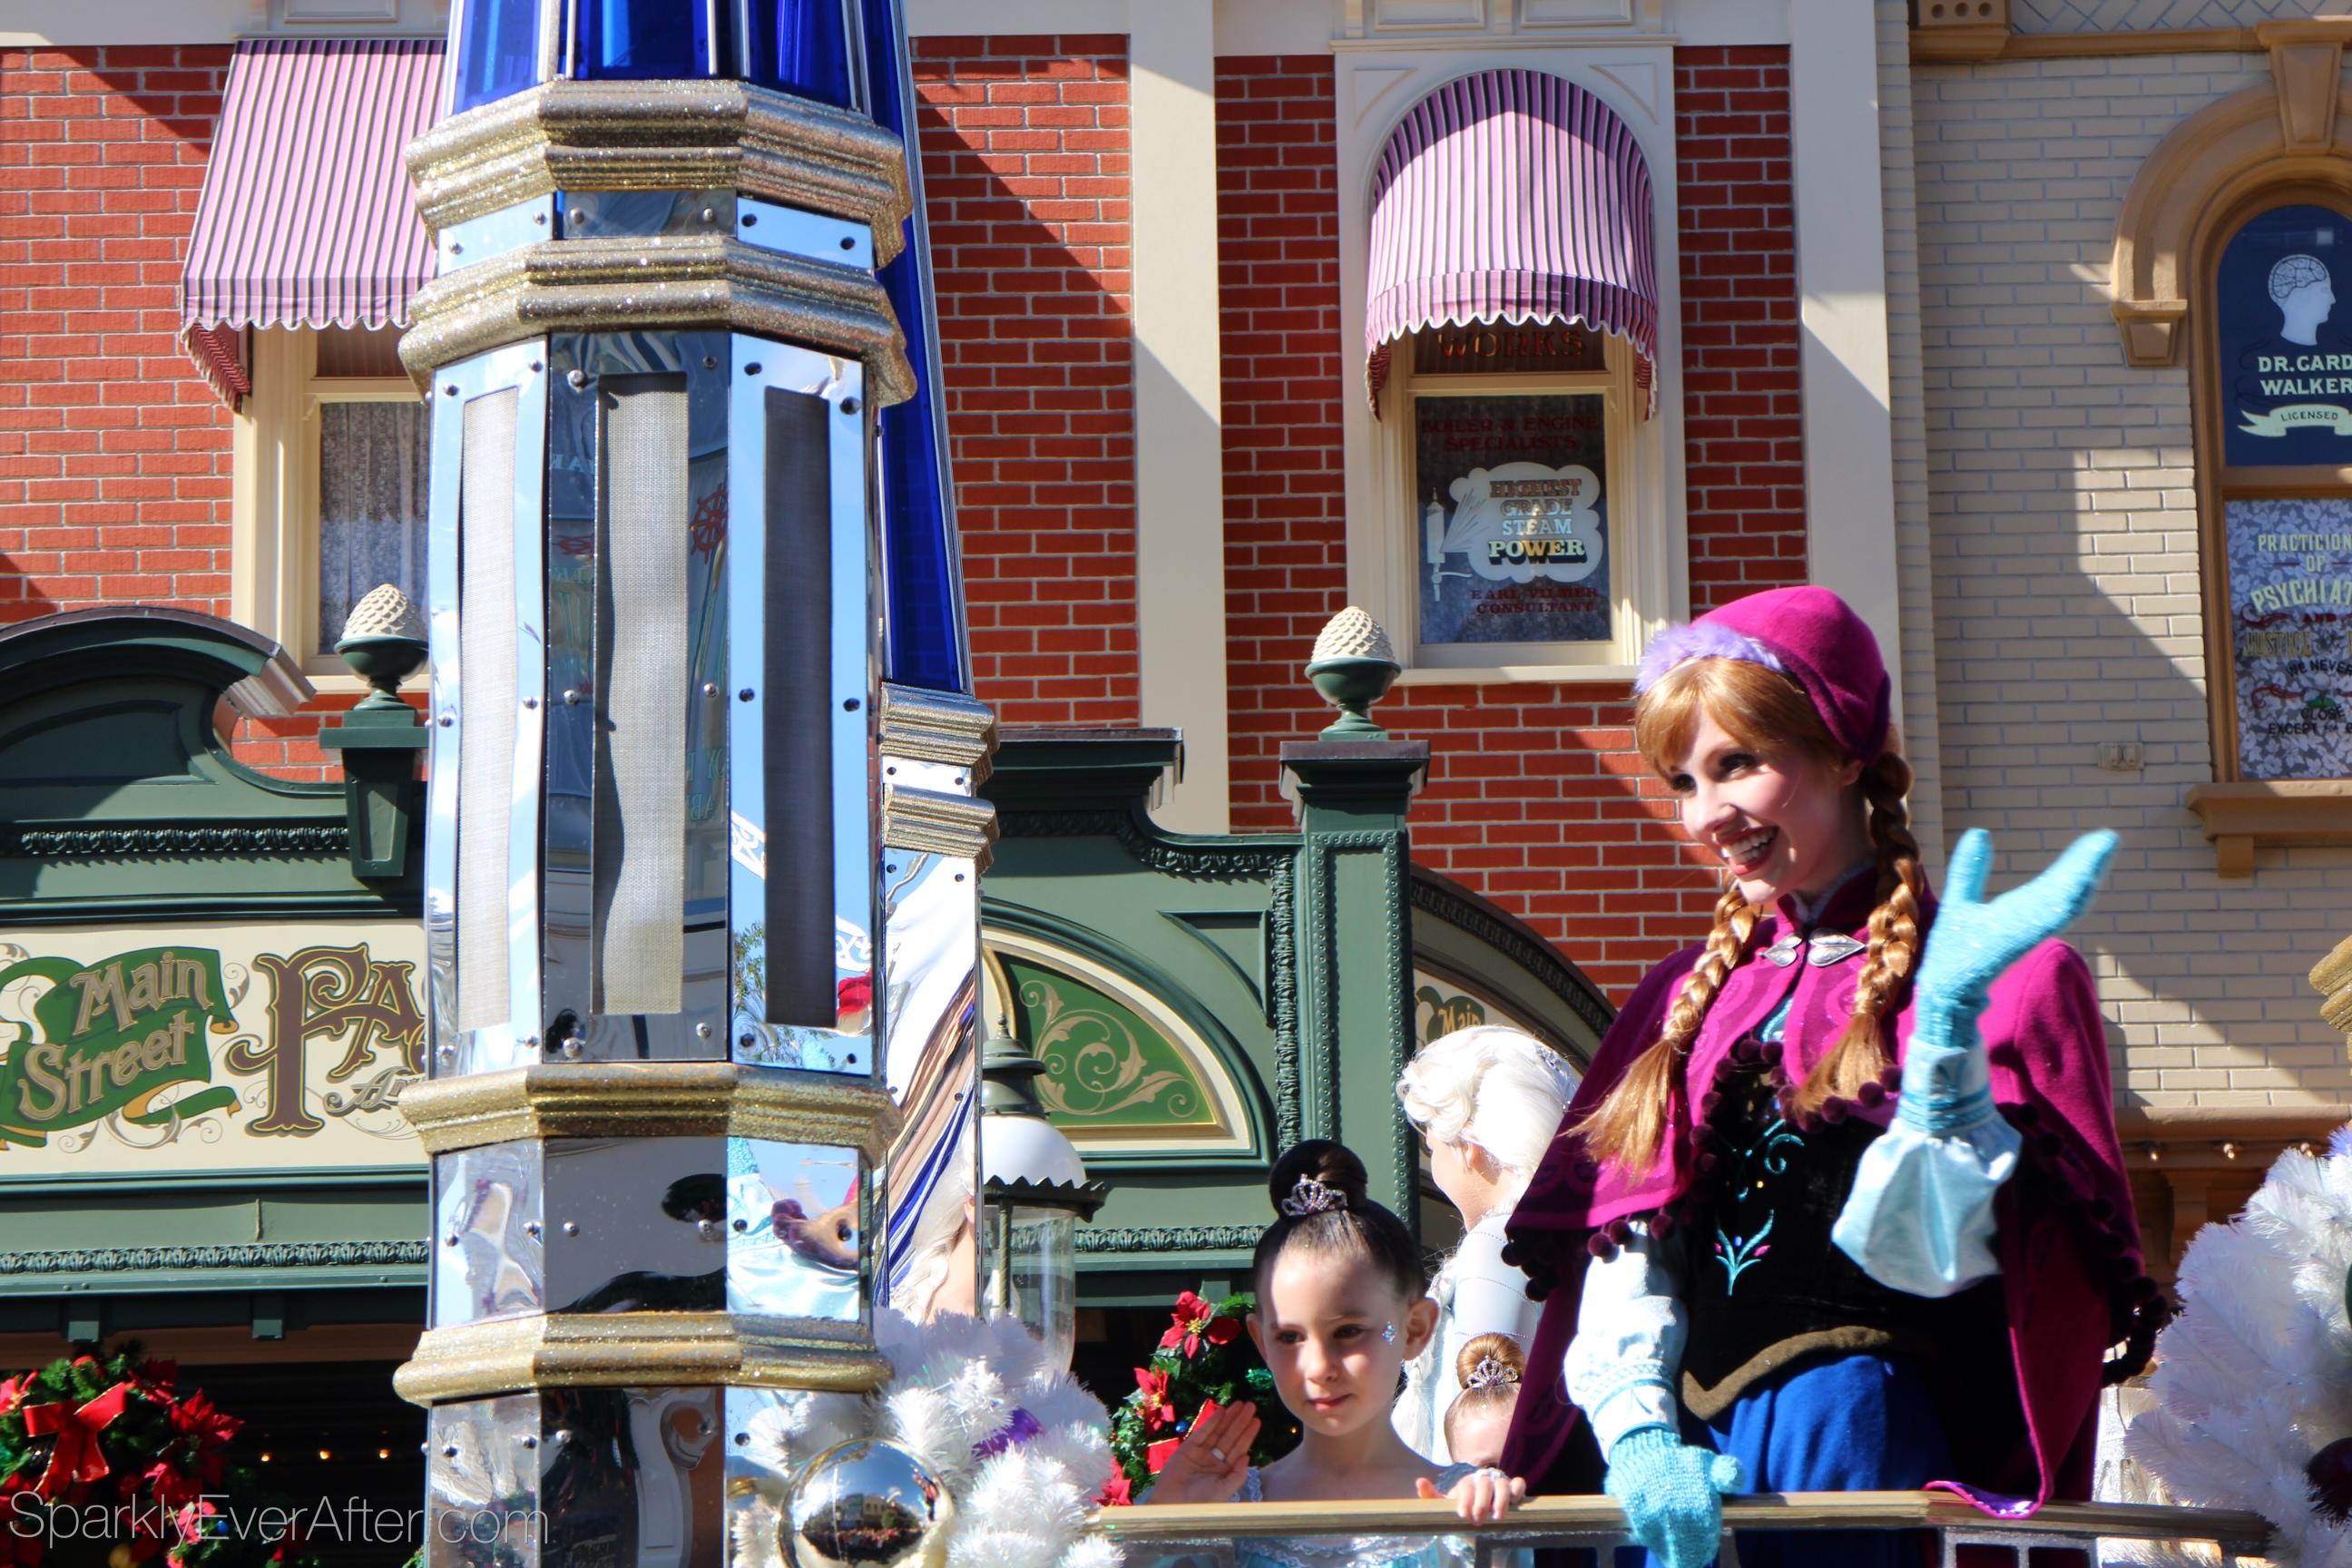 Disney Christmas Parade Filming & Details - Sparkly Ever After